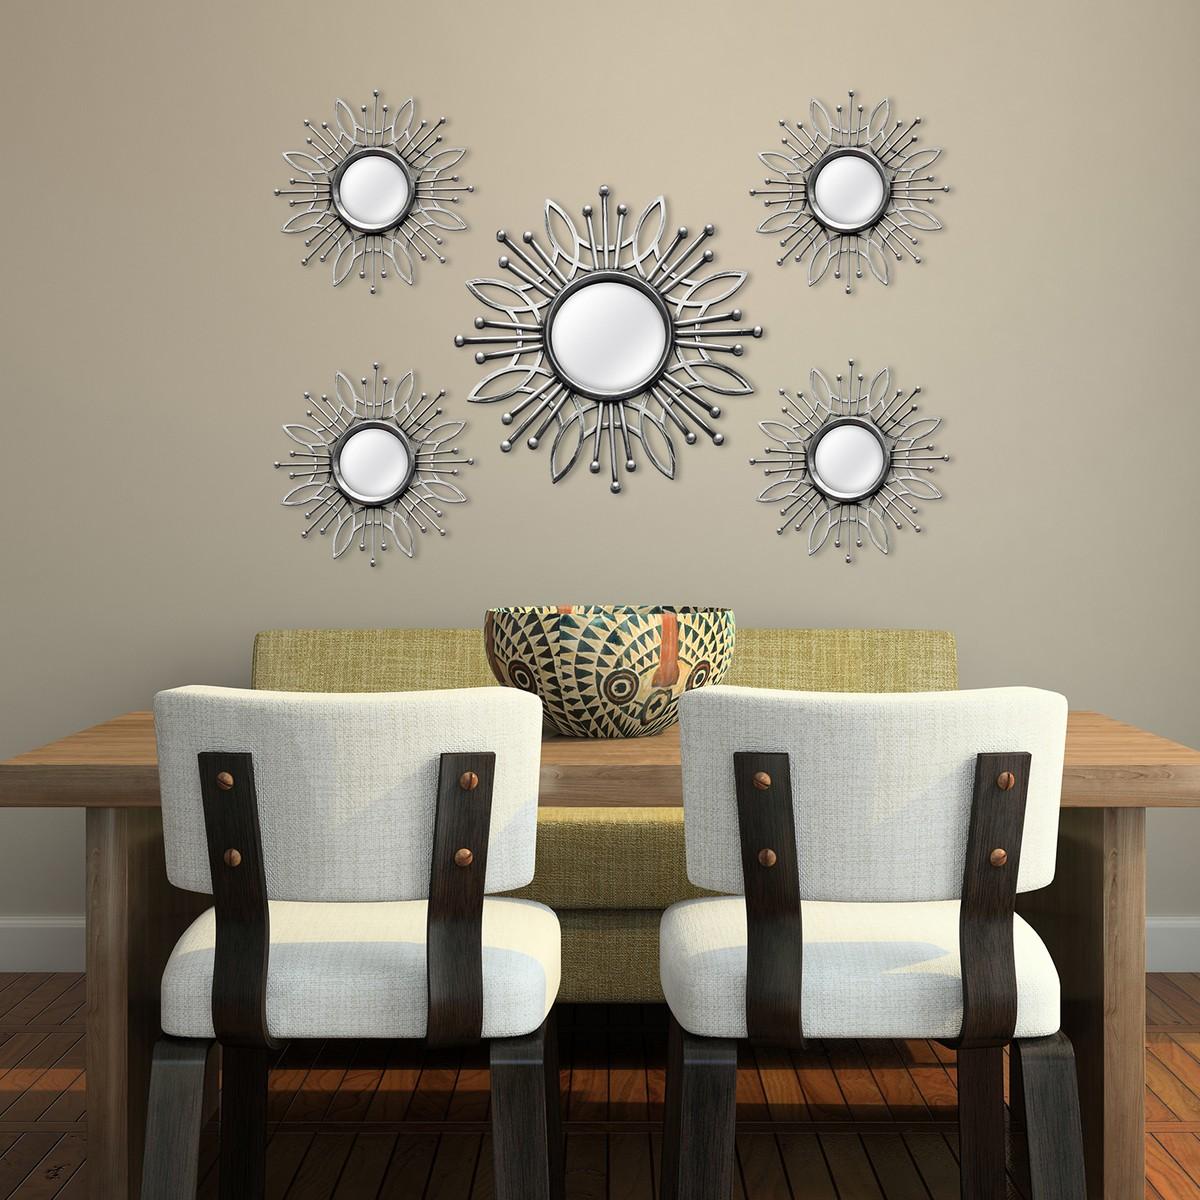 Stratton Home Decor 5 Piece Silver Burst Wall Mirror - Silver